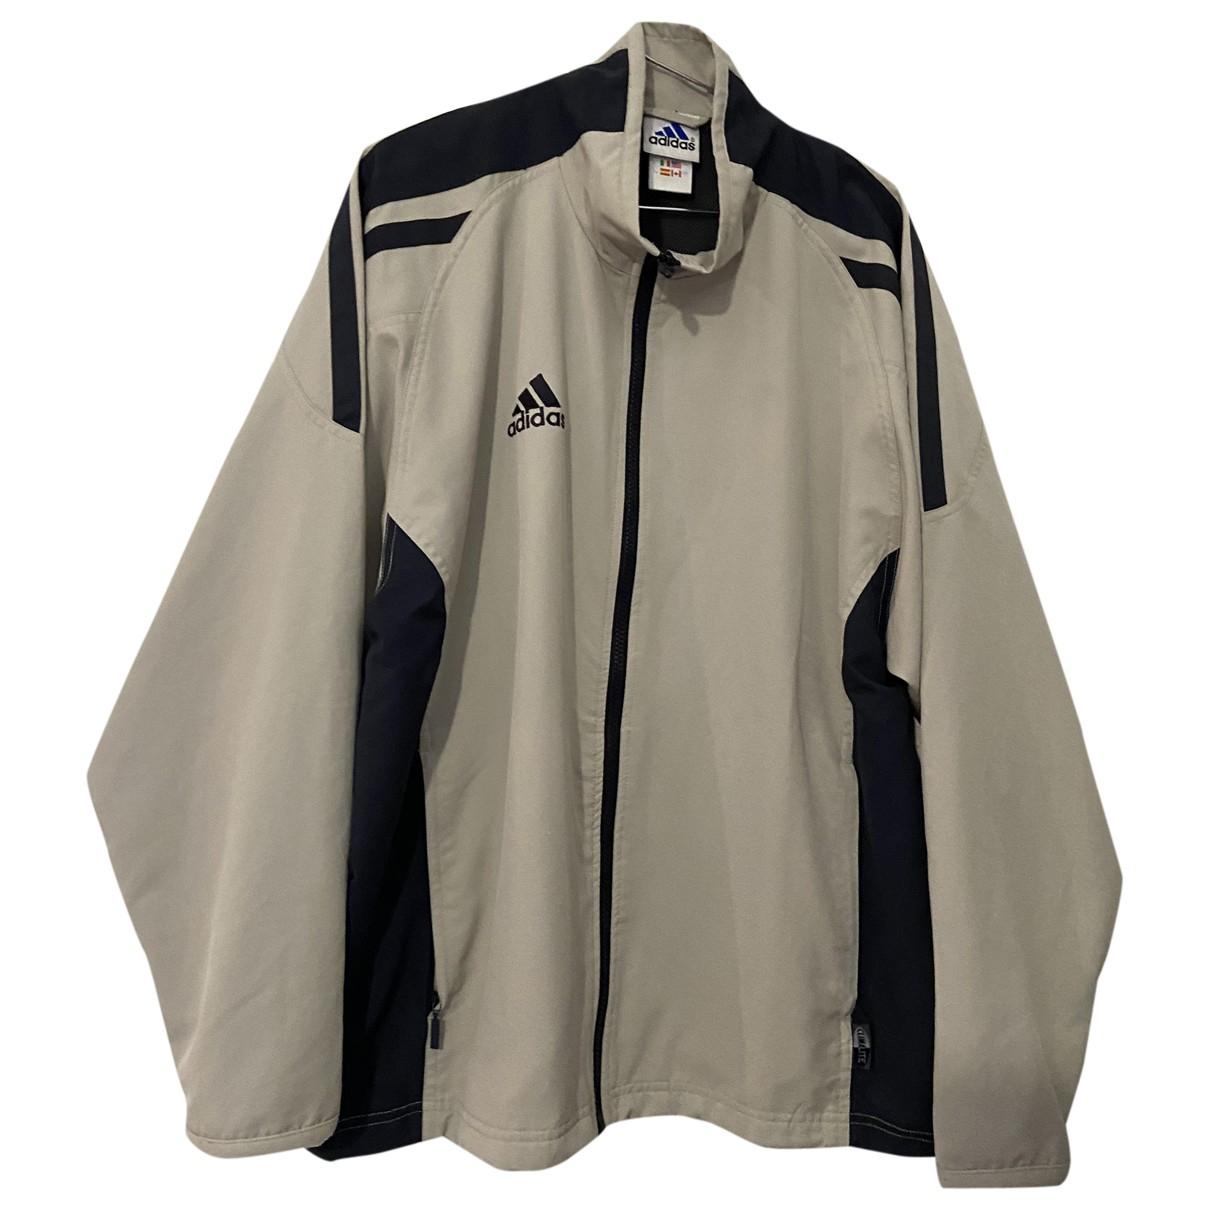 Adidas \N Jacke in  Beige Polyester